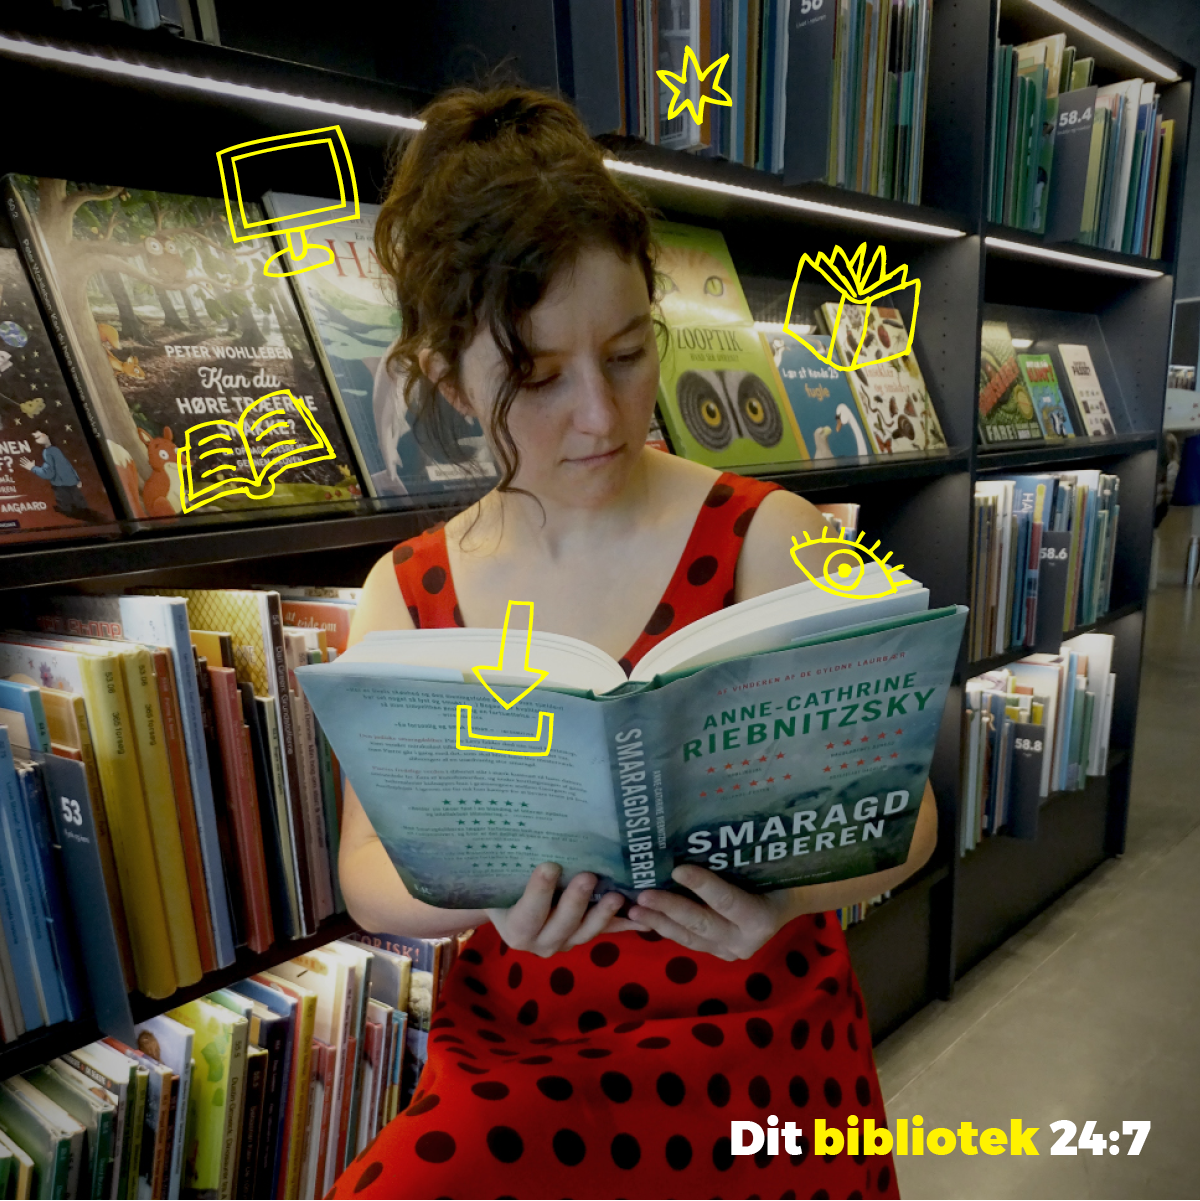 Dit bibliotek 24:7_6. Sociale medier opslag. Litteratursiden